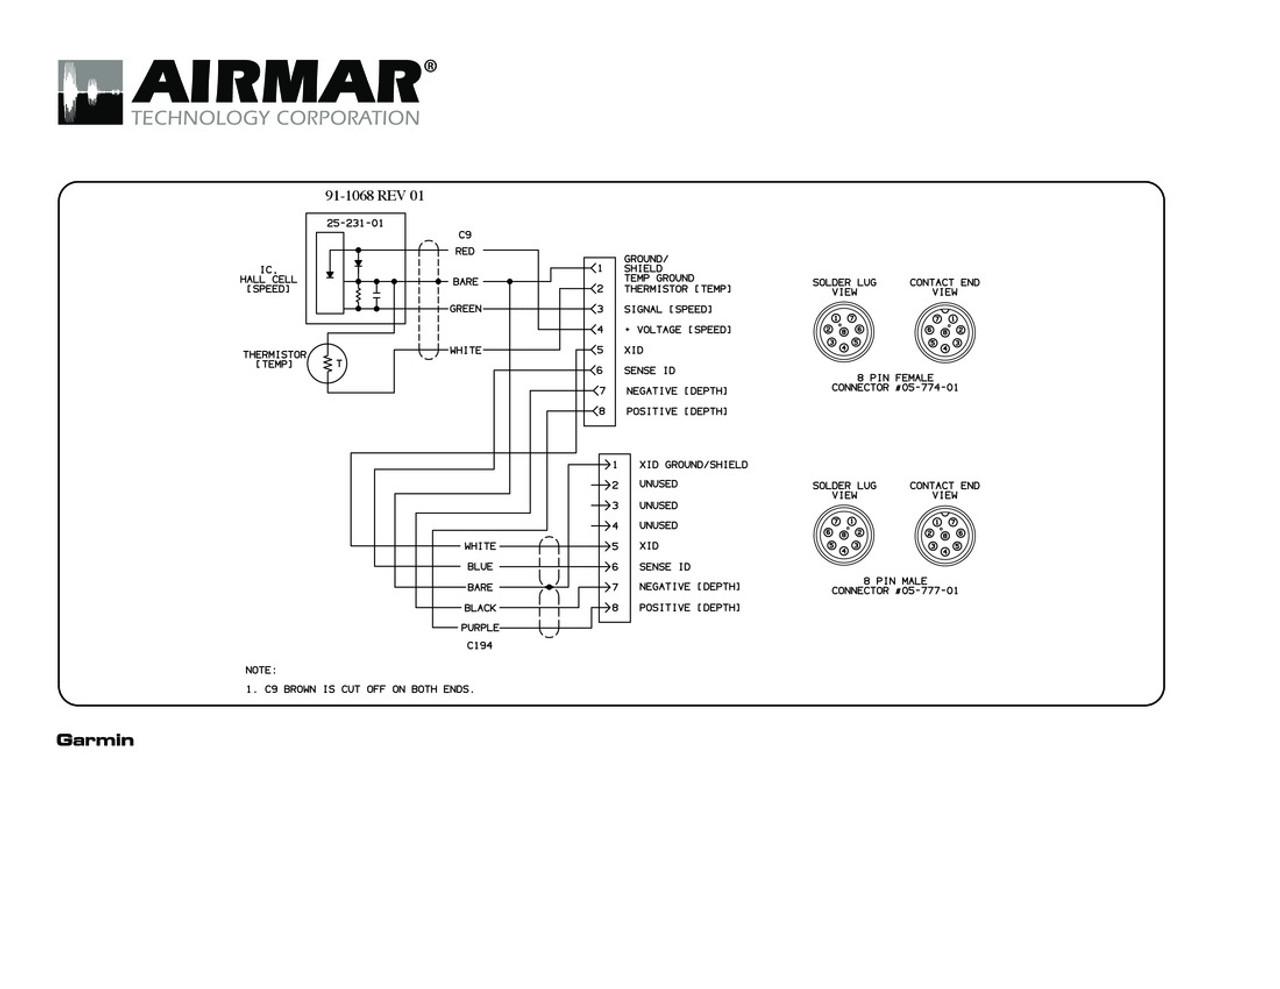 small resolution of airmar wiring diagram garmin st850 8 pin s t blue bottle marine mirror